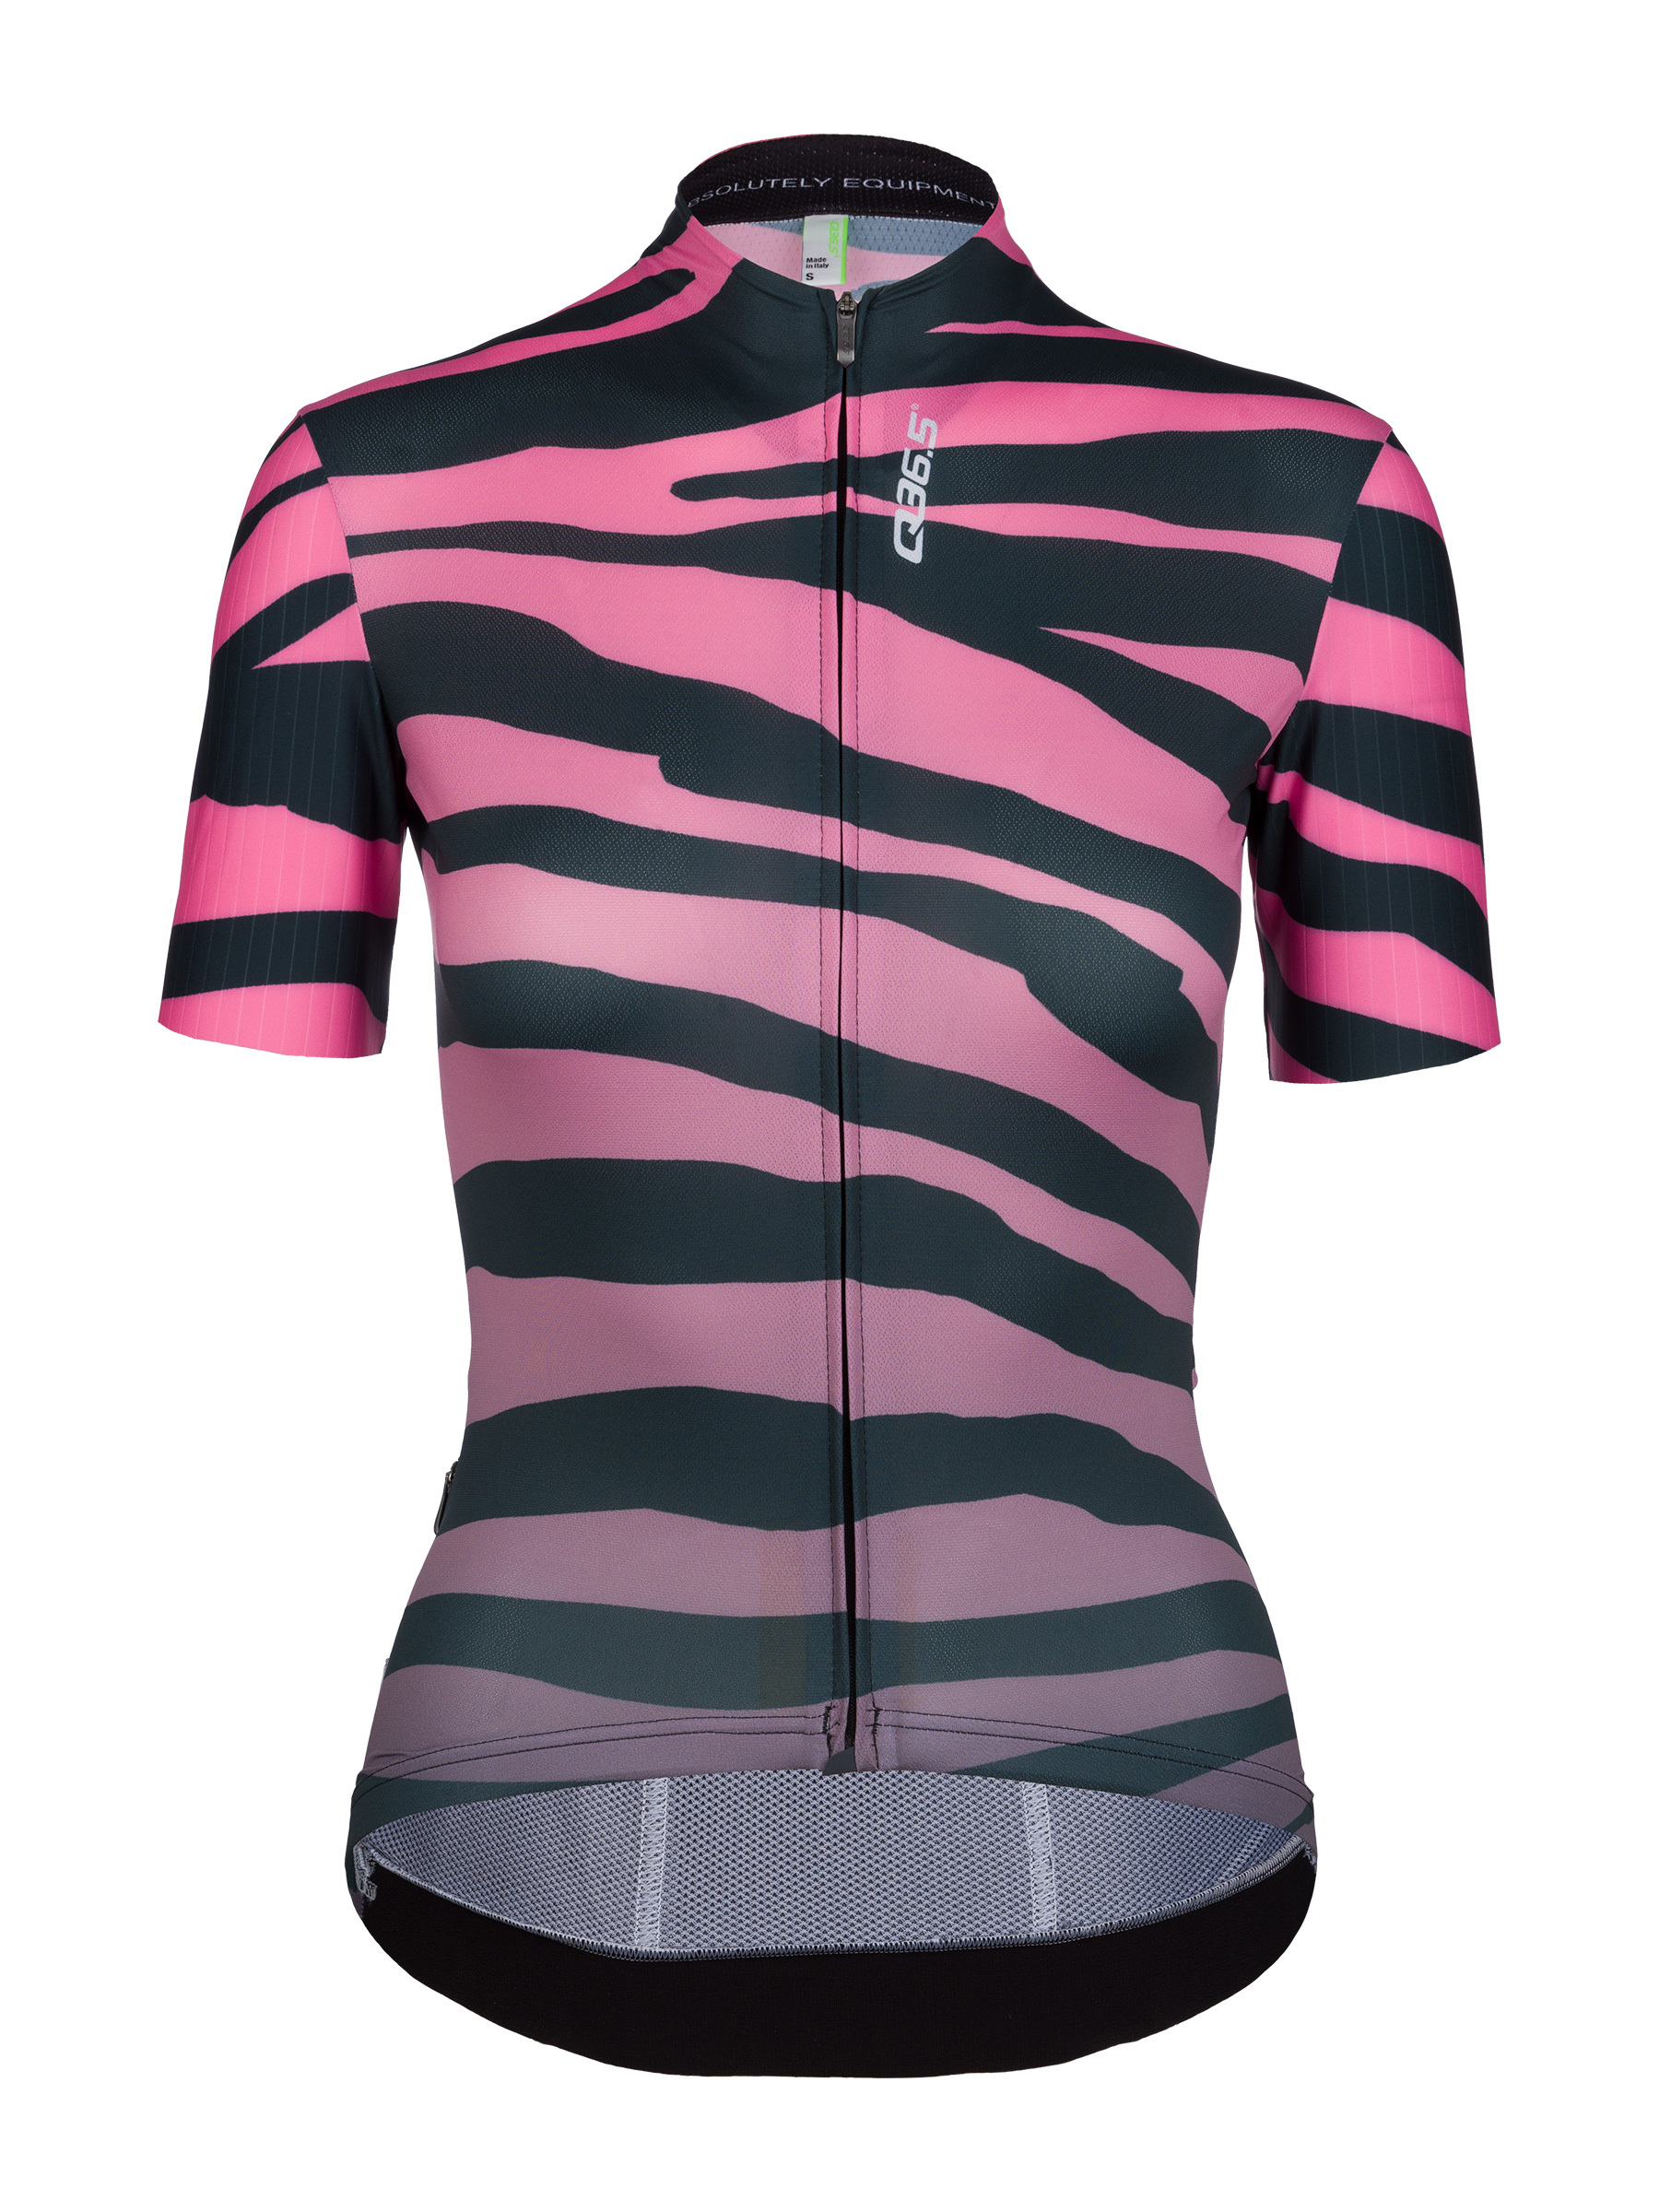 womens cycling short sleeve jersey G1 woman tiger pink